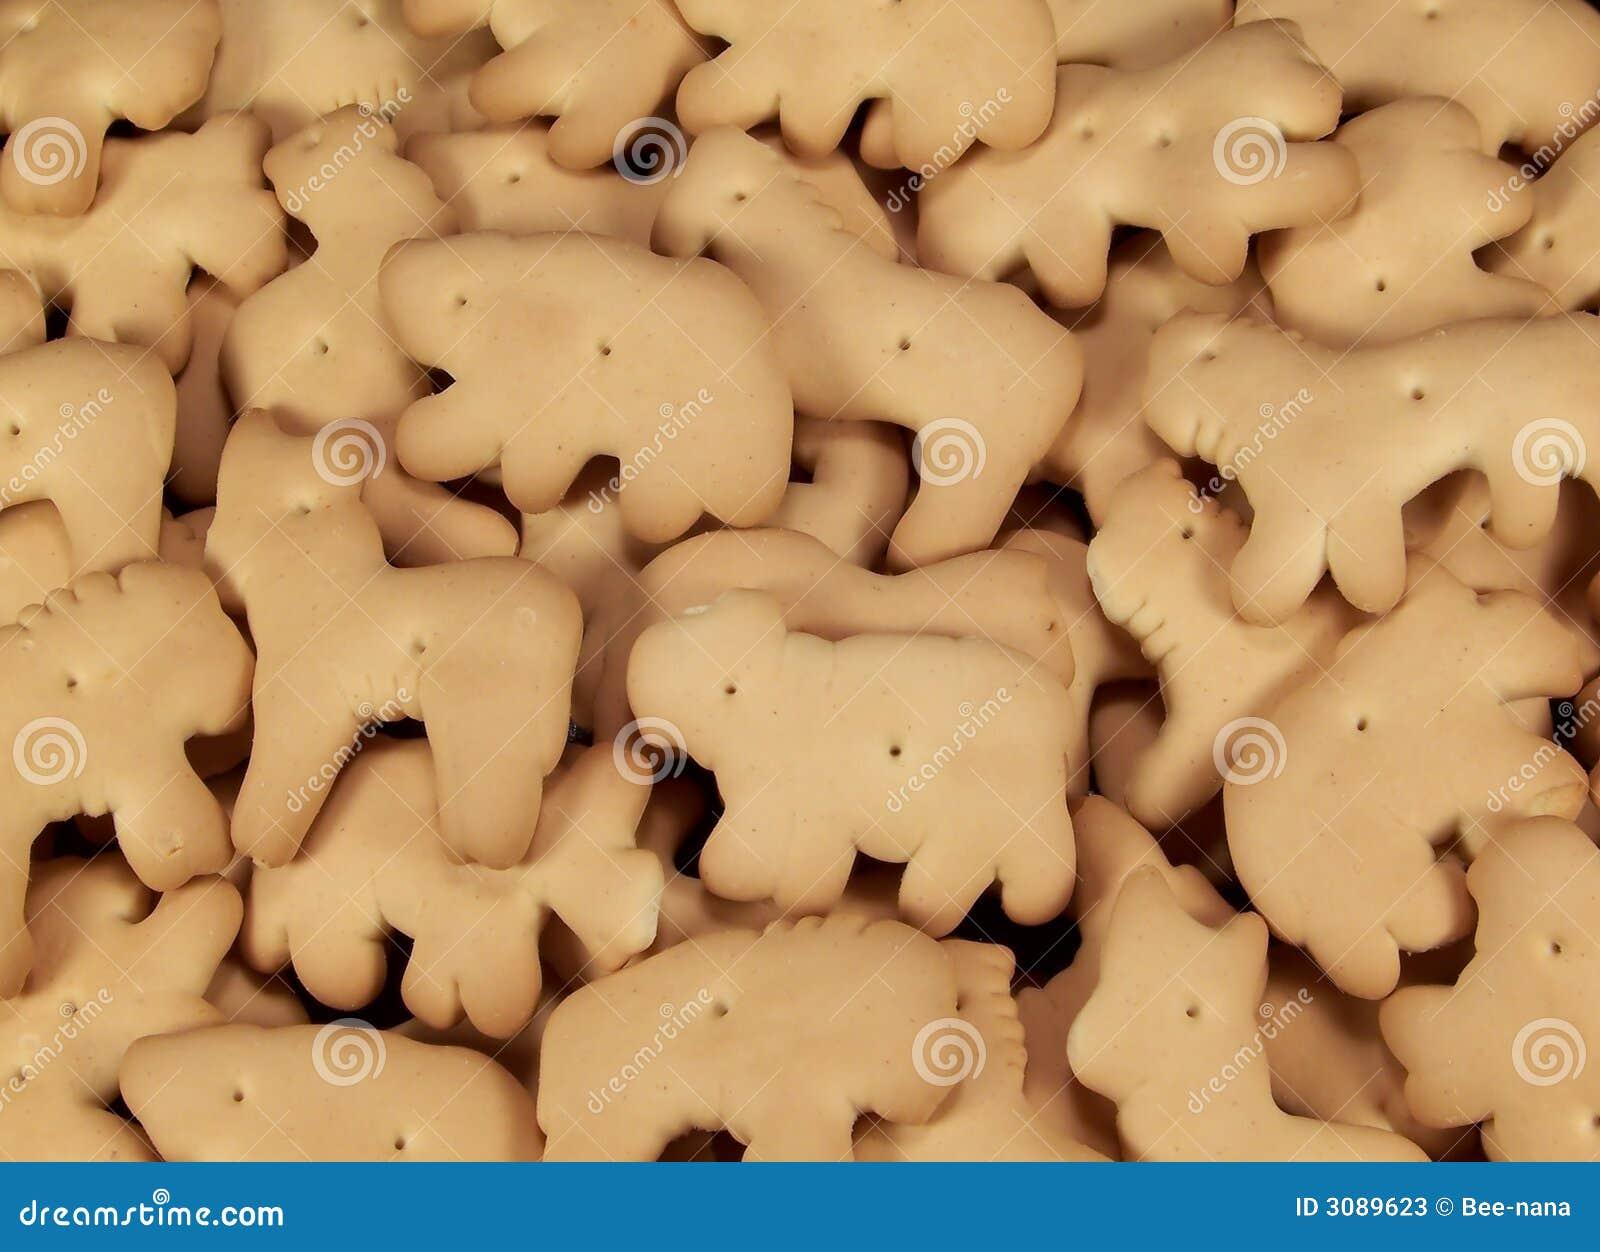 Animal Crackers Stock Photos - Image: 3089623